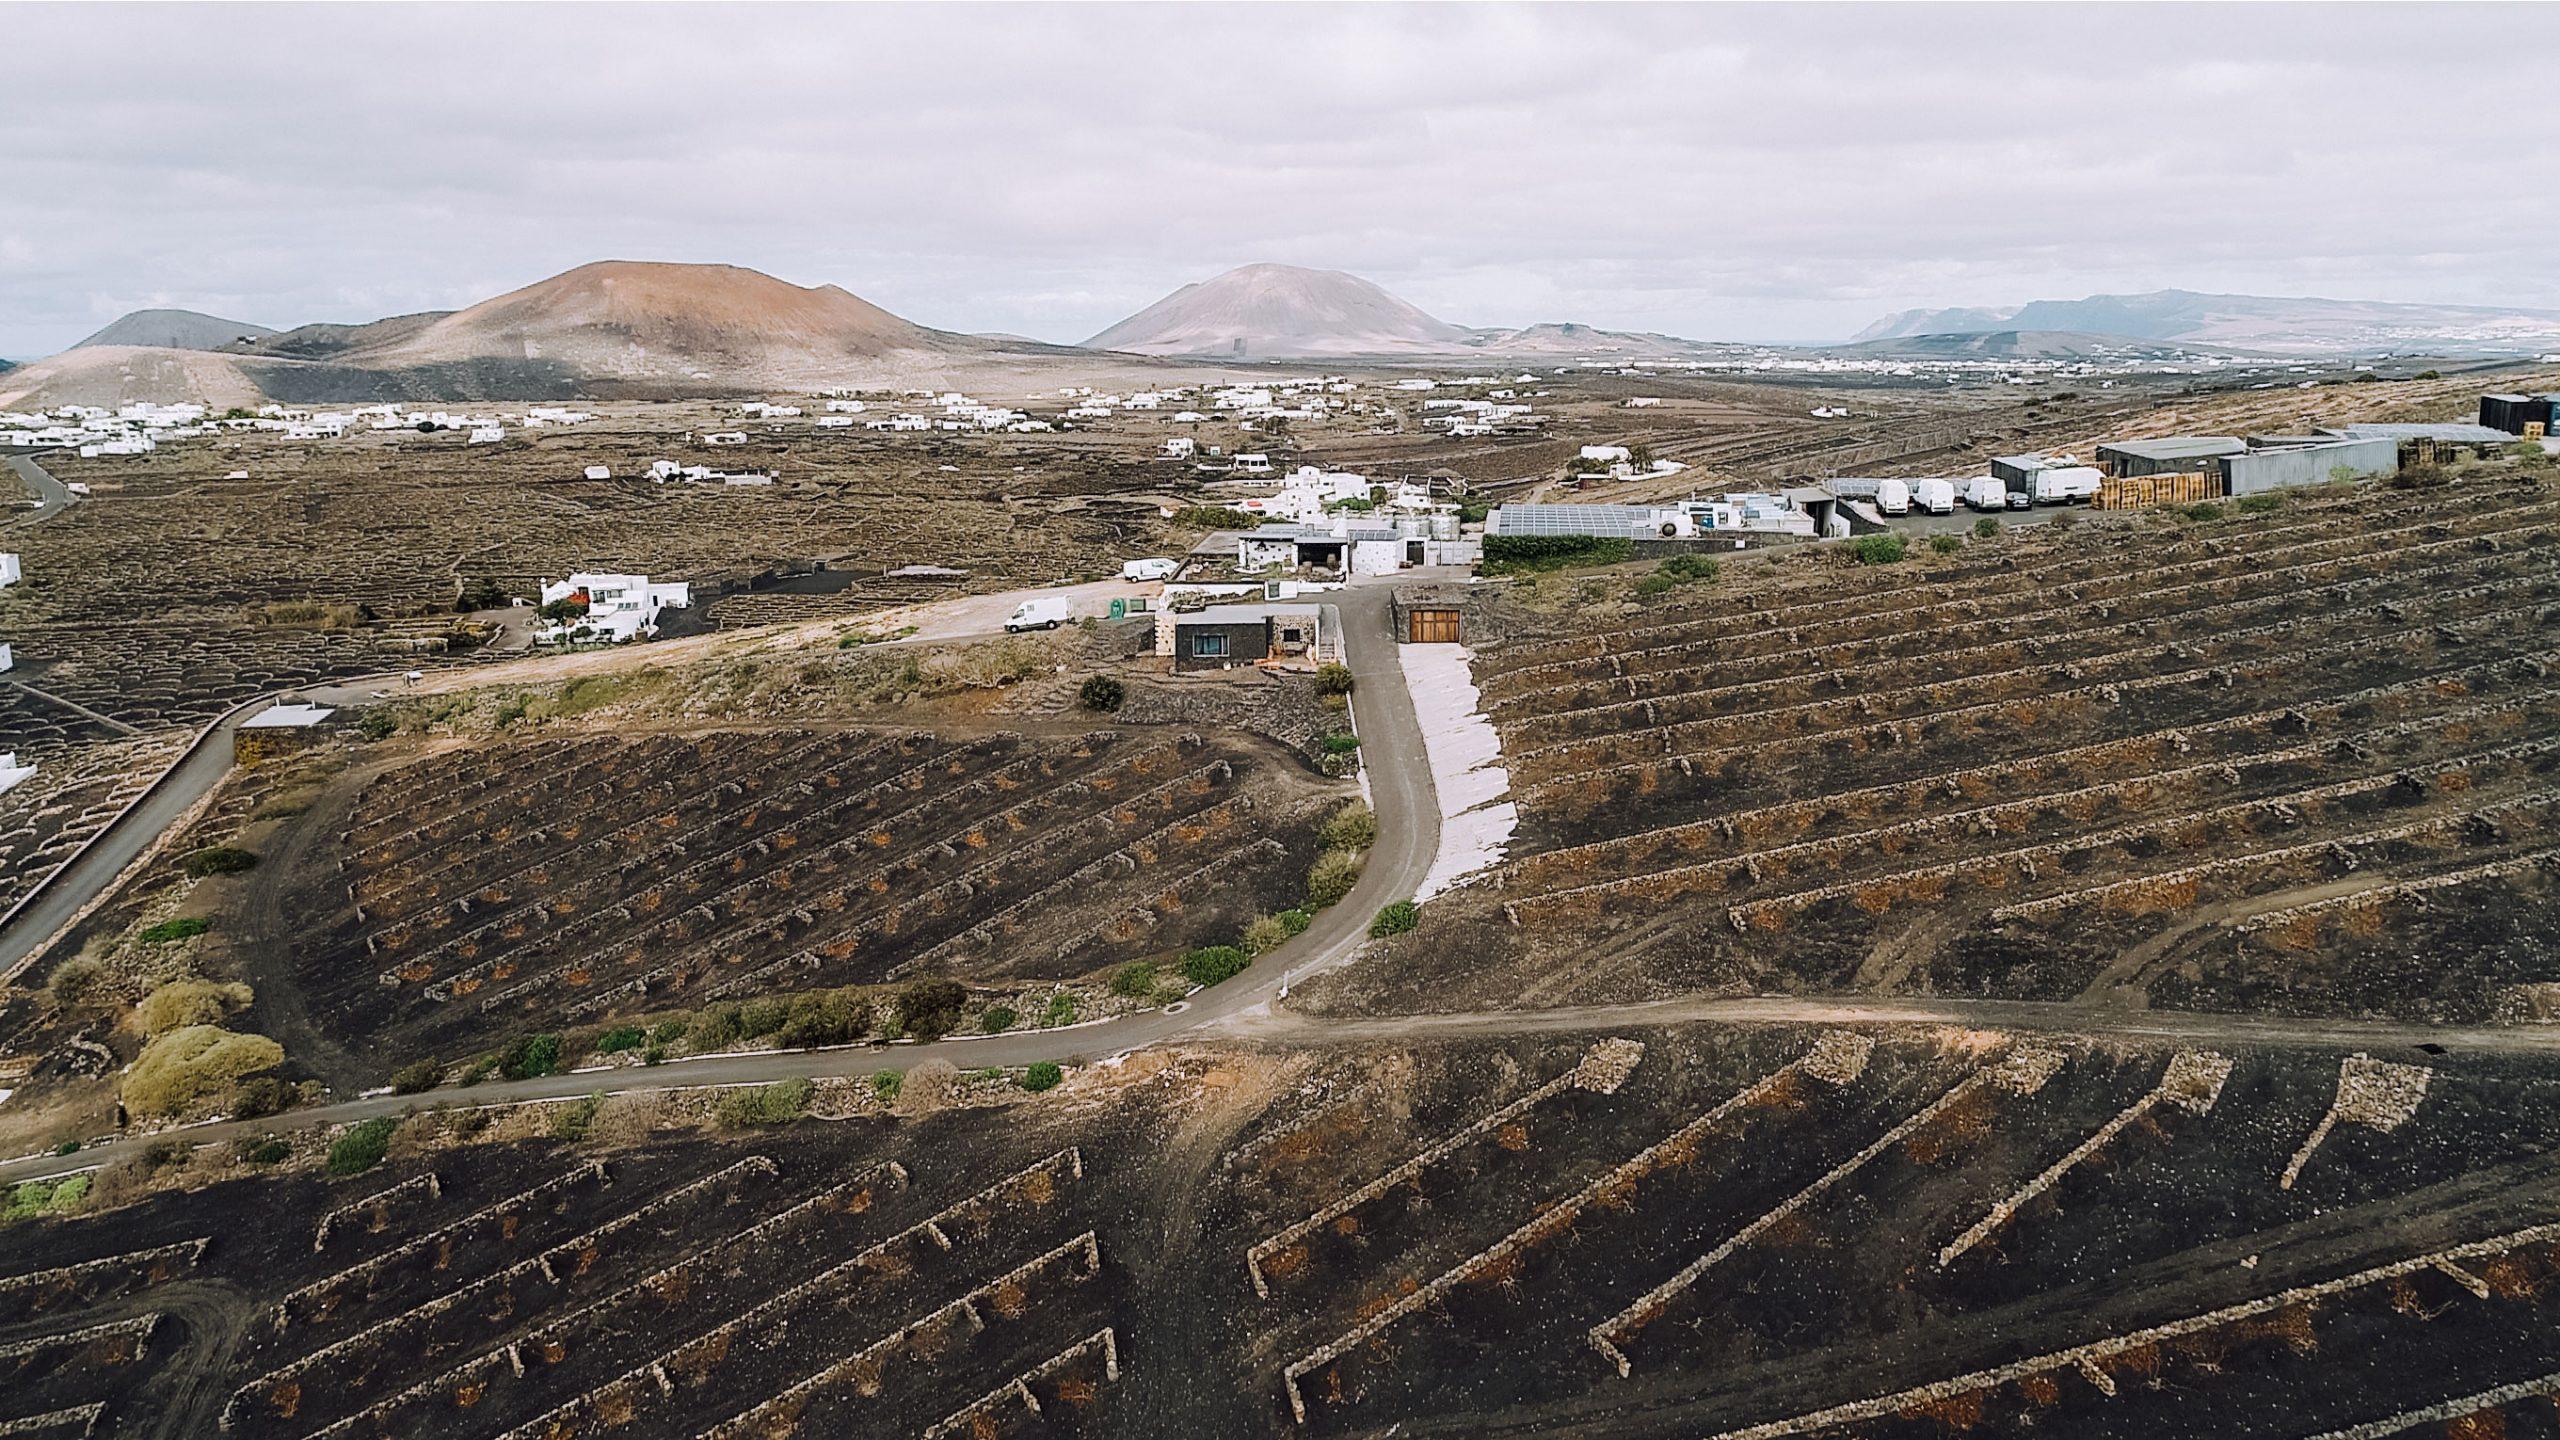 Vegadeyuco.com Winery and vineyards in La Geria